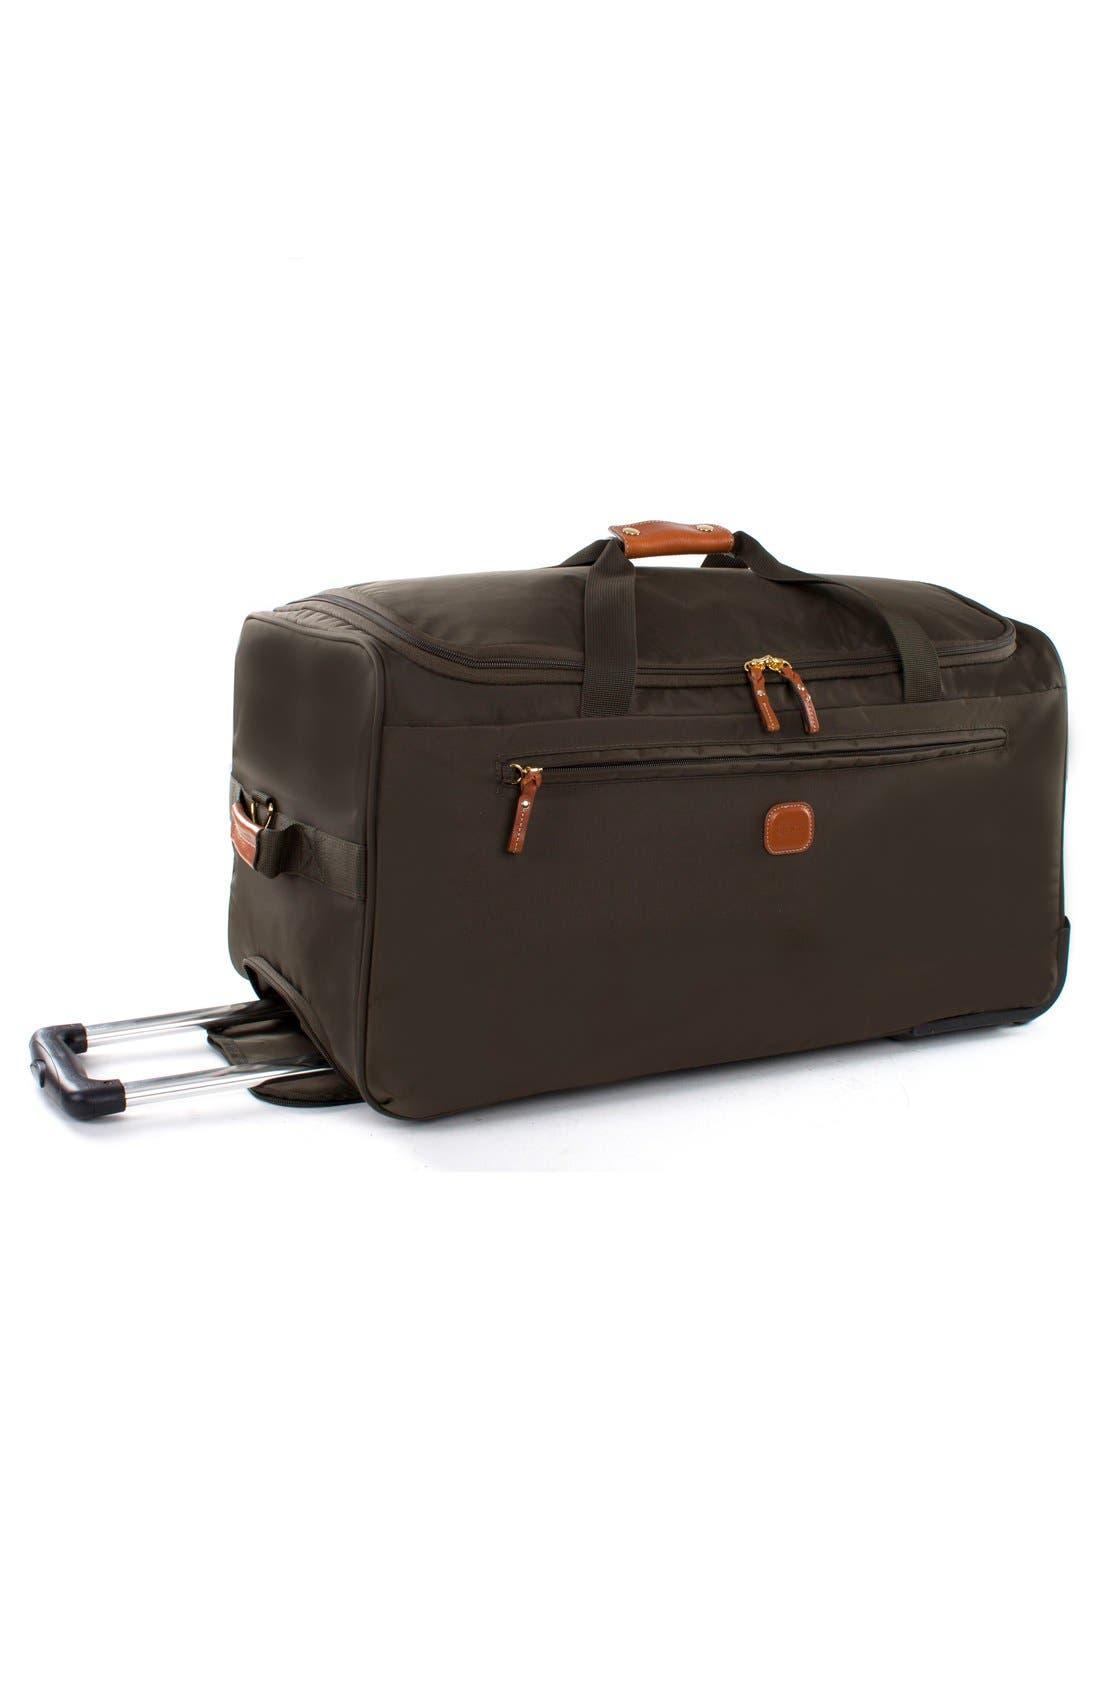 X-Bag 28-Inch Rolling Duffel Bag,                             Alternate thumbnail 4, color,                             Olive